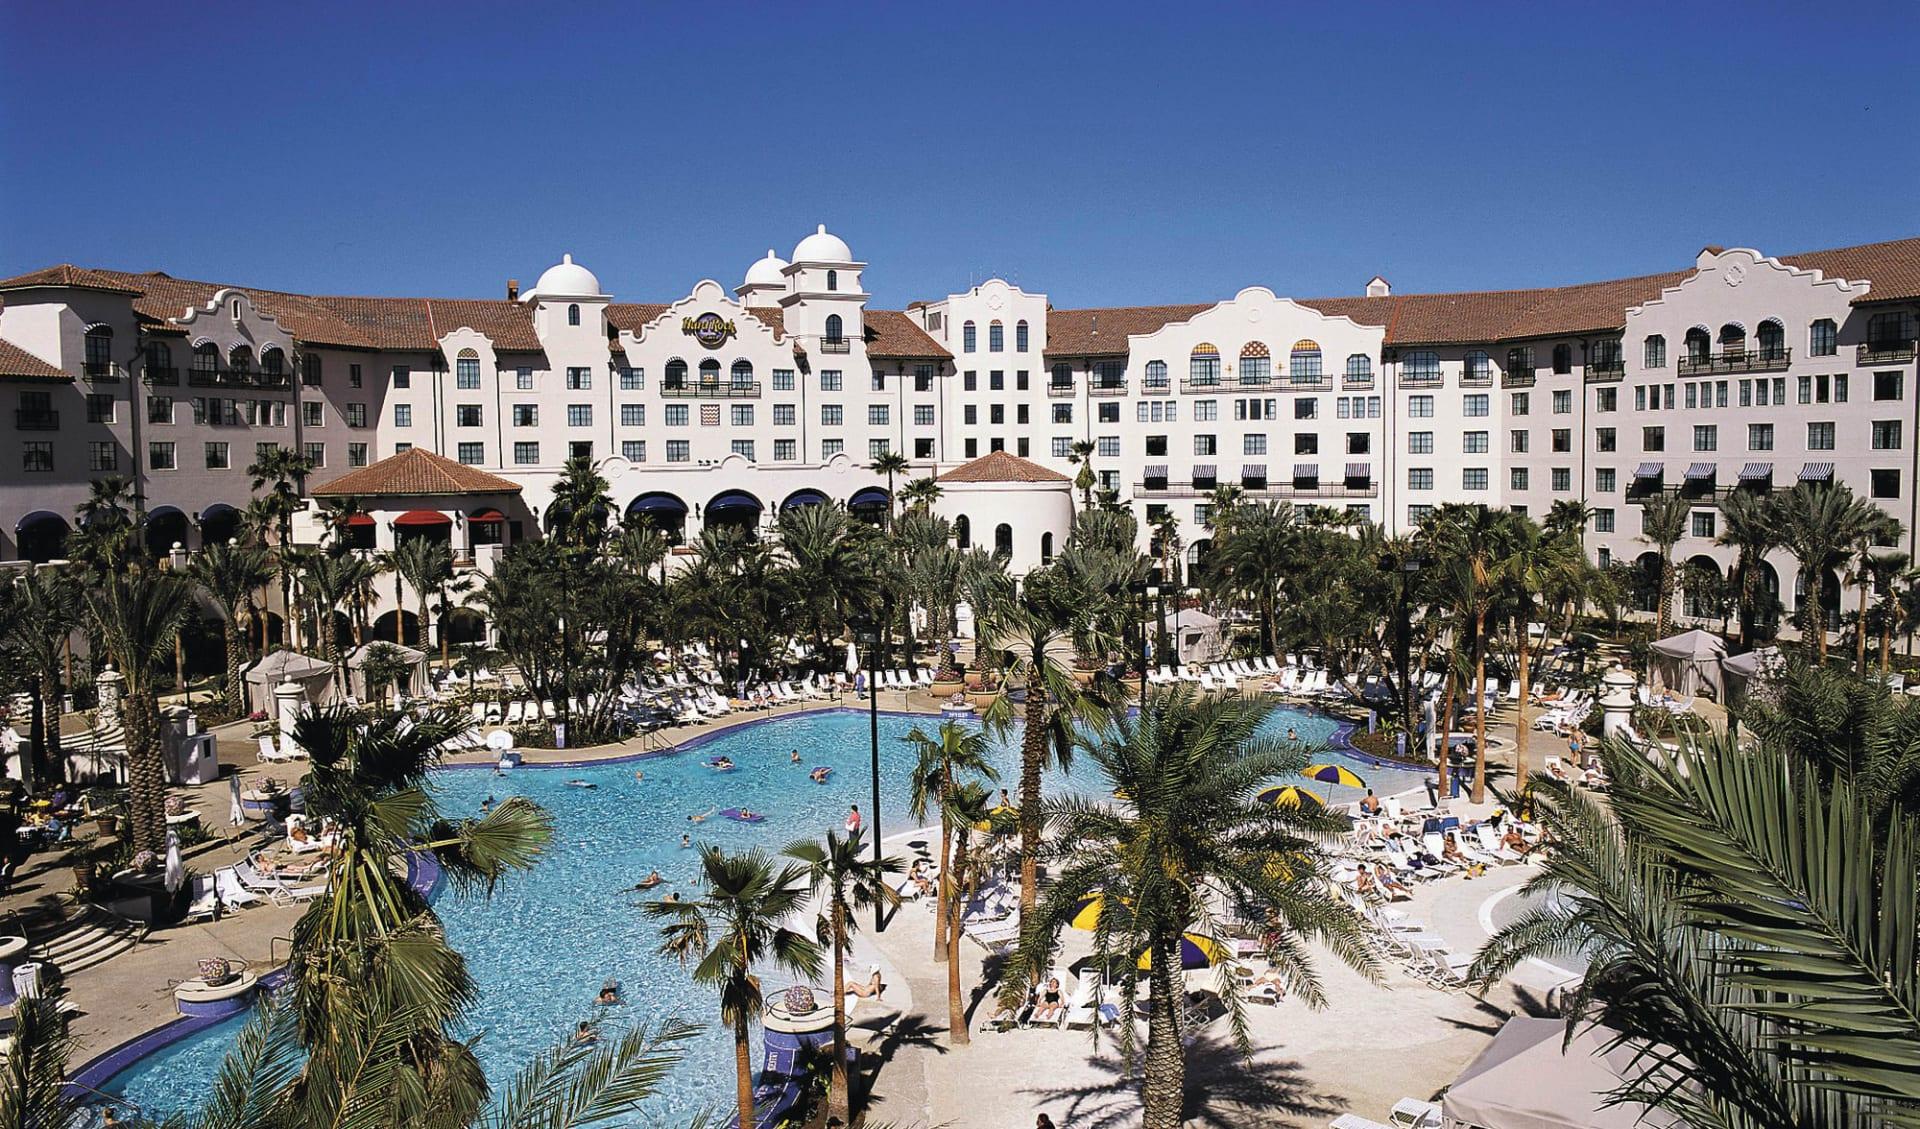 Hard Rock Hotel Orlando:  Hard Rock Hotel Orlando - Aussenpool